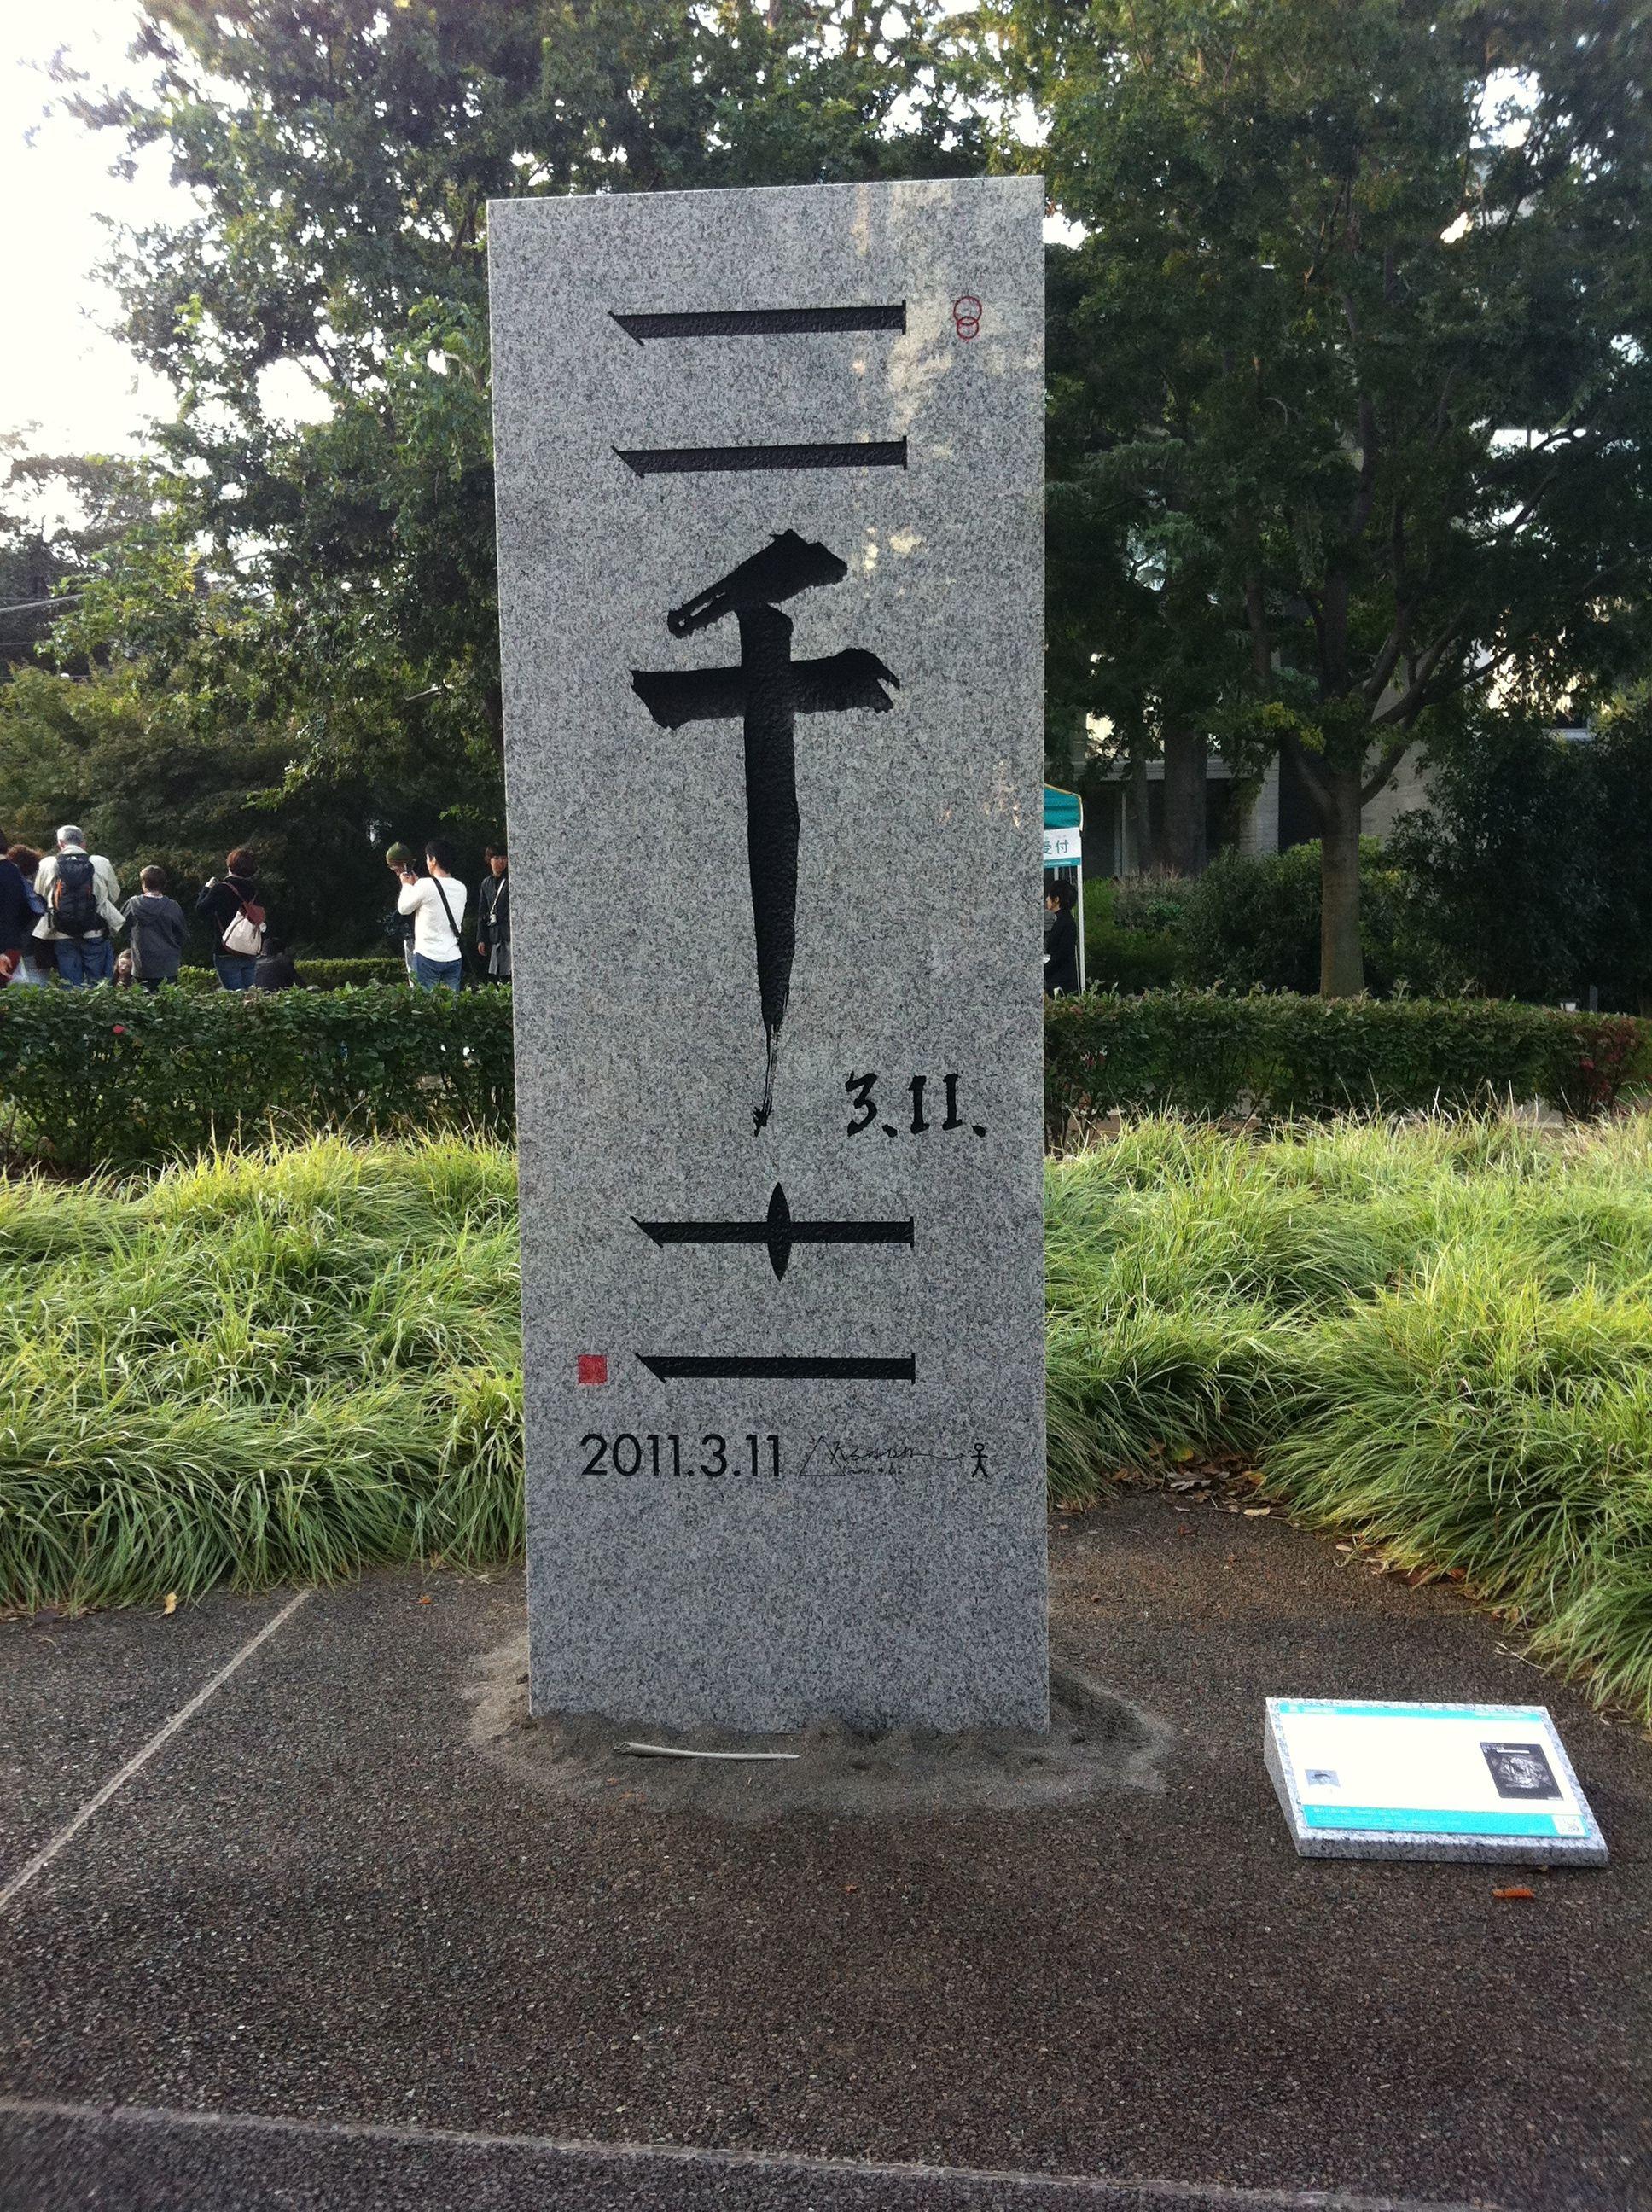 Tokyo, Japan   Monument dedicated to Earthquake and Tsunami victims, 3-11